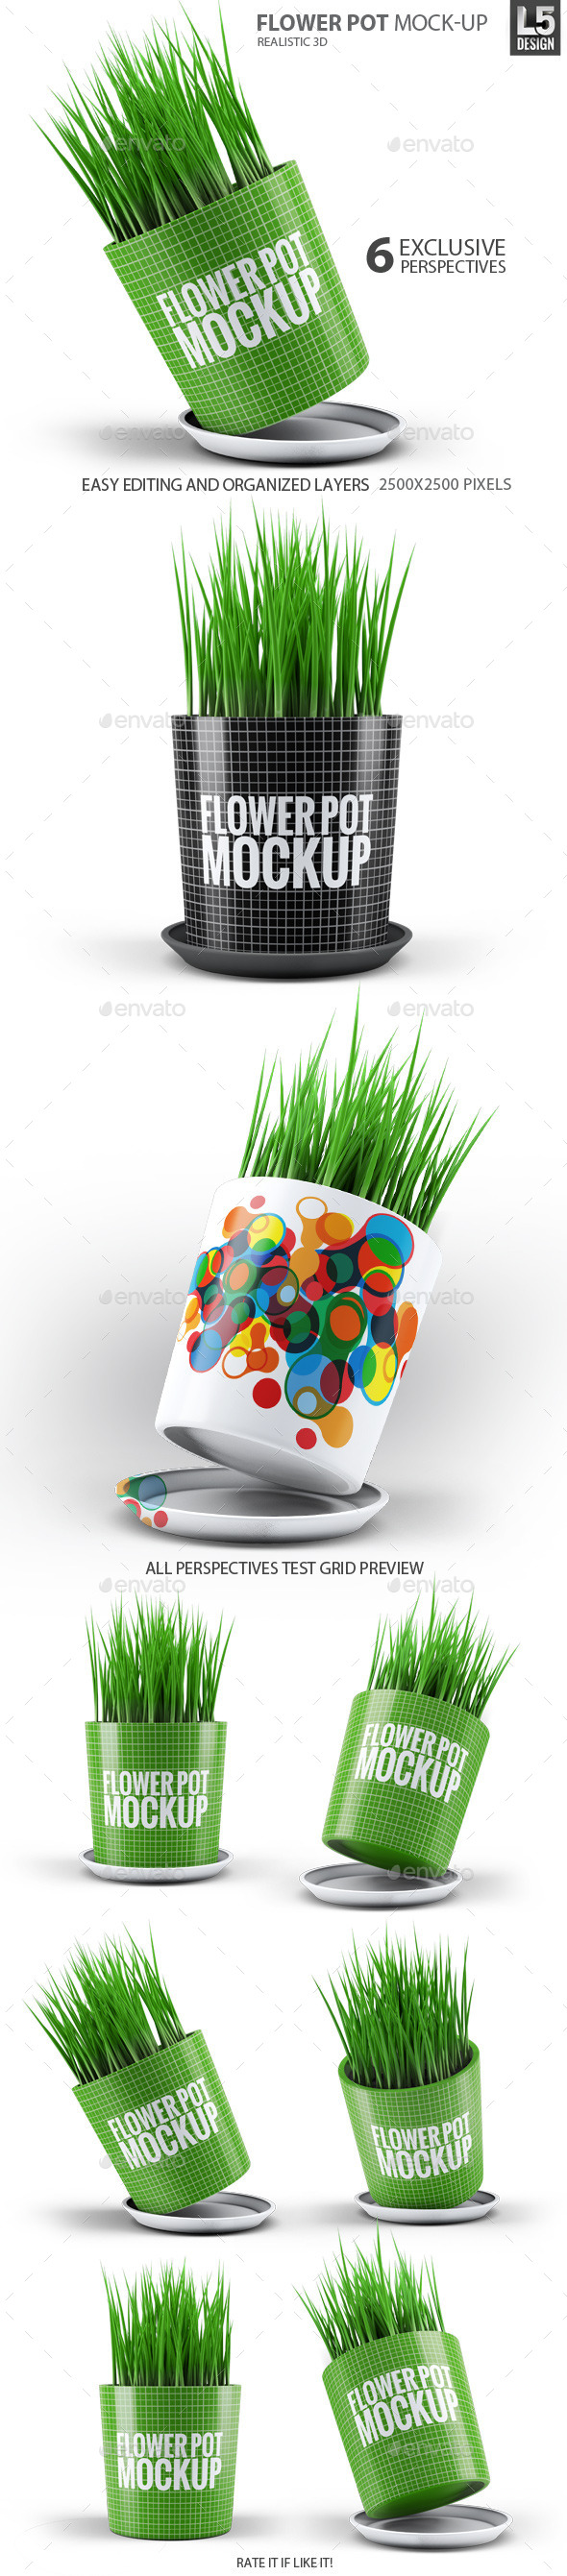 Flower Pot Mock-Up - Product Mock-Ups Graphics